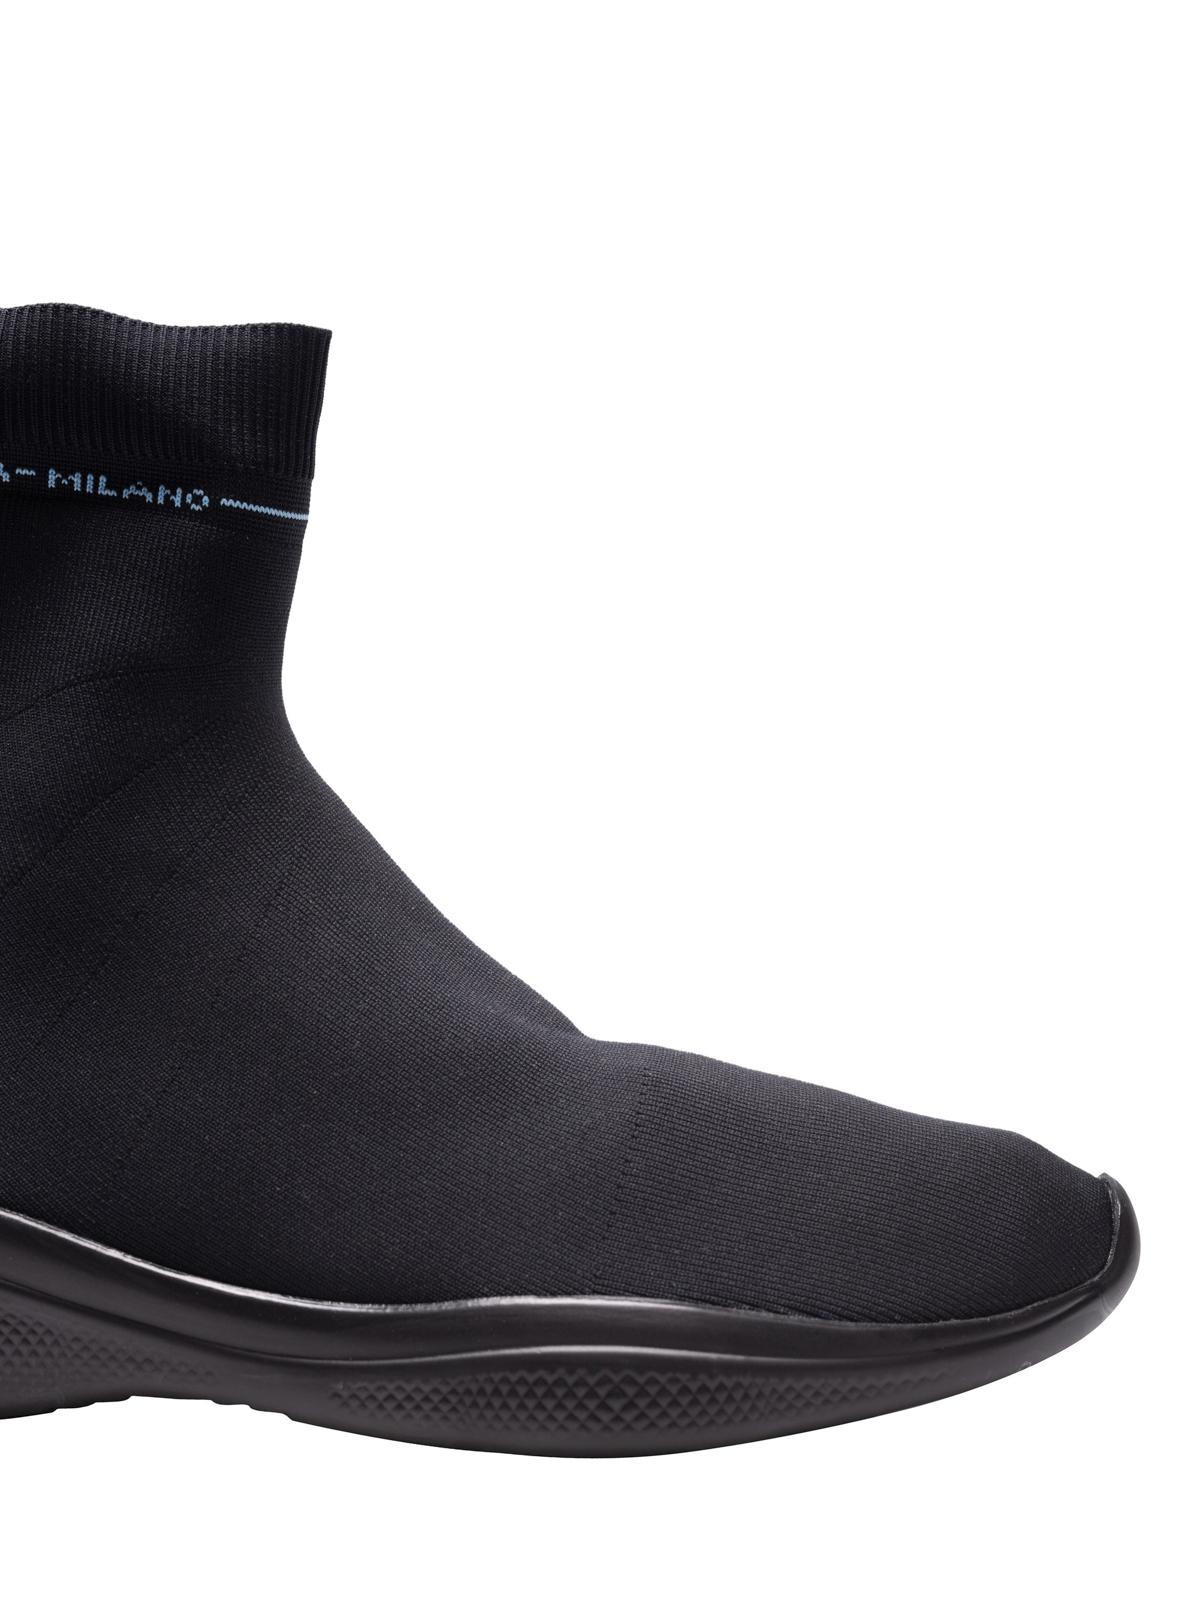 Prada - Black stretch fabric sock slip